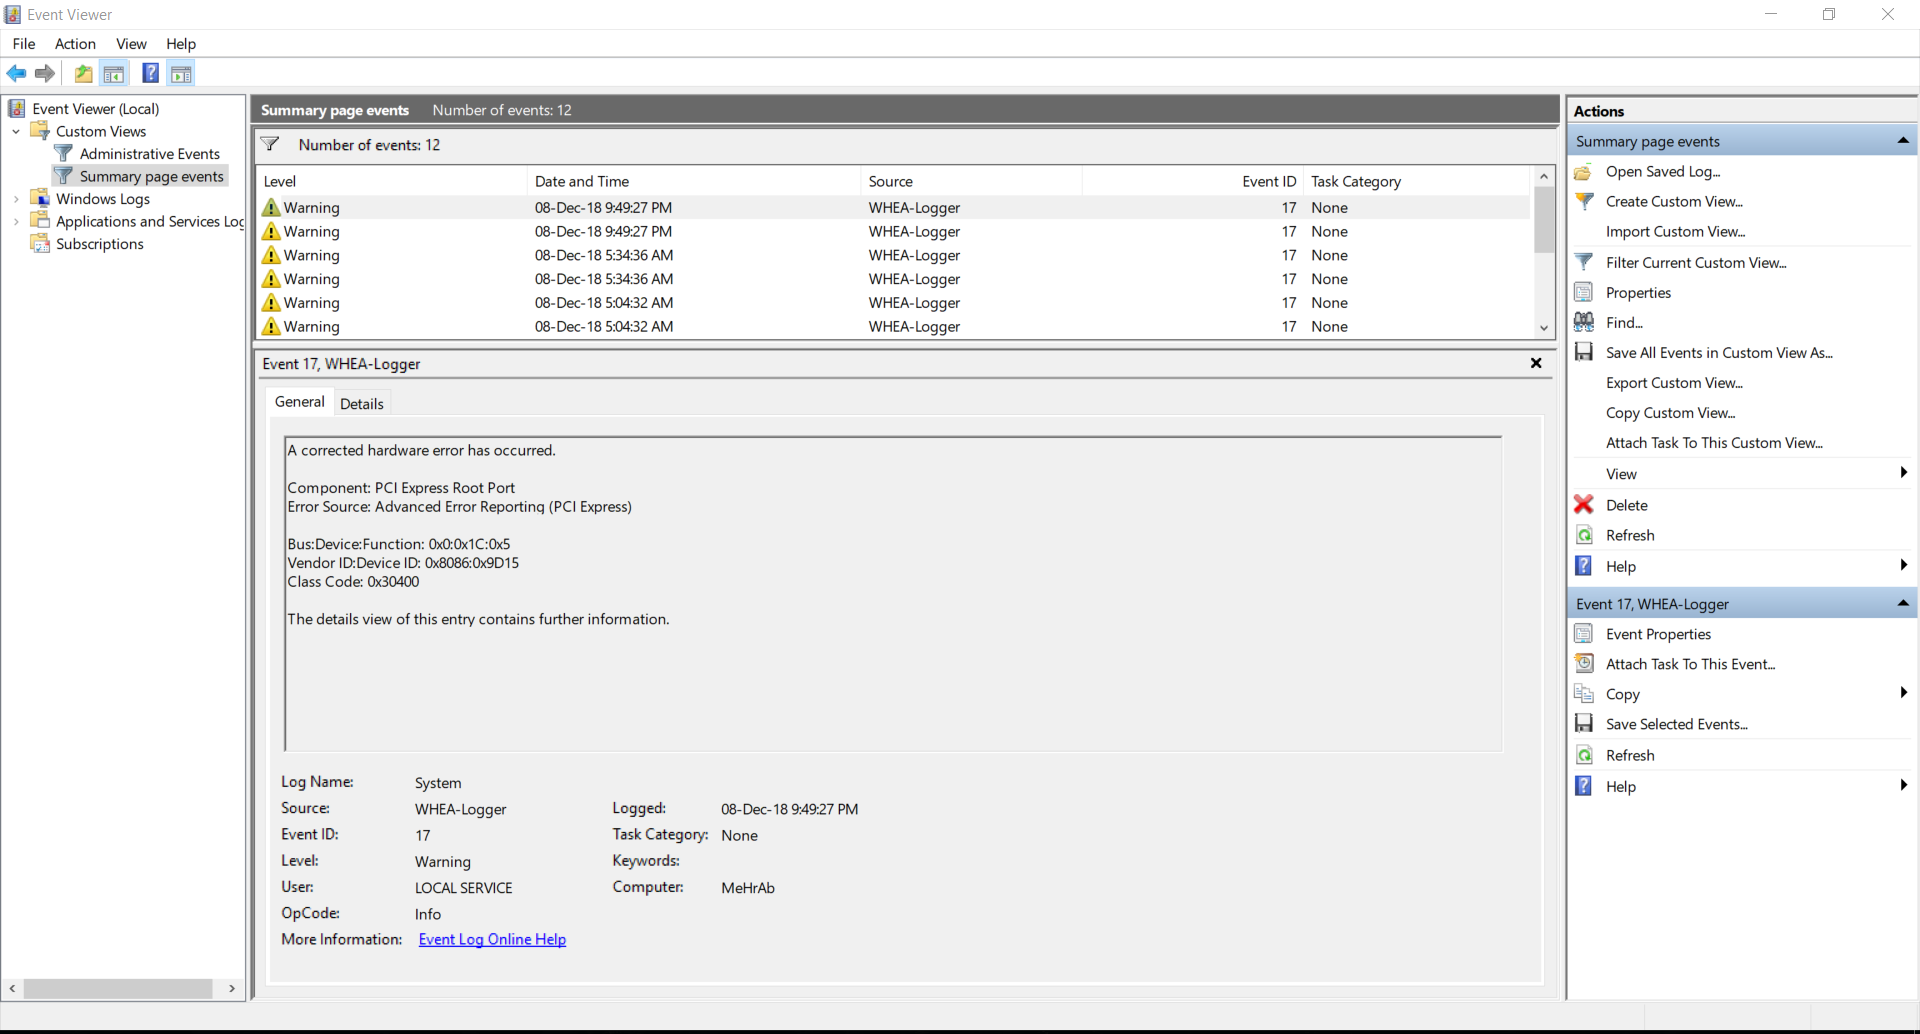 WHEA-Logger event ID 17, Windows 10 - Microsoft Community